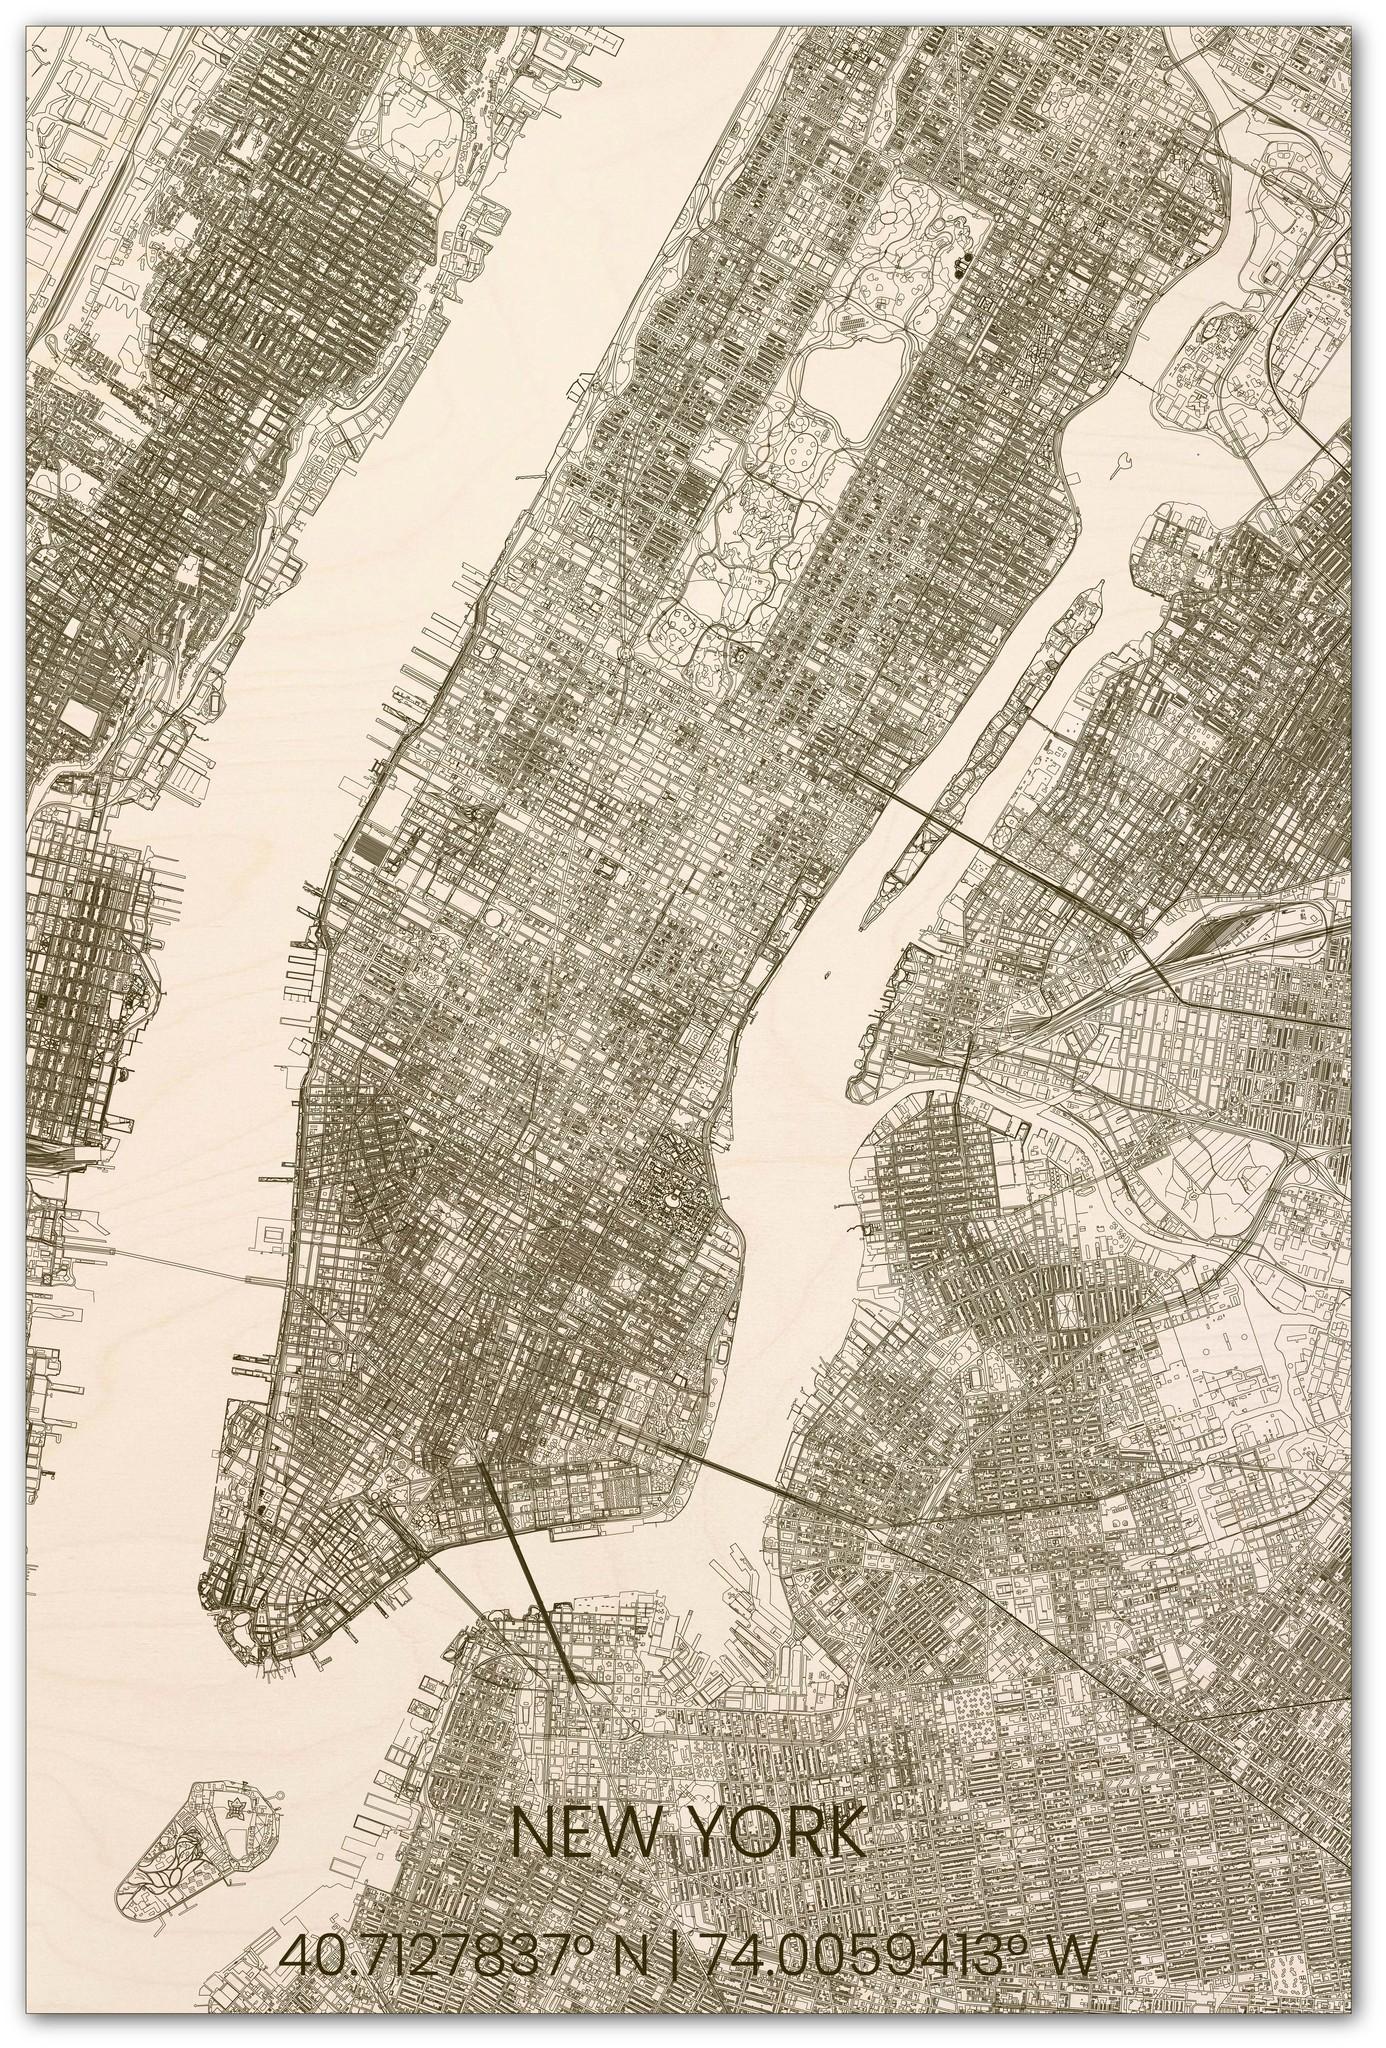 Stadsplattegrond New York XL-1